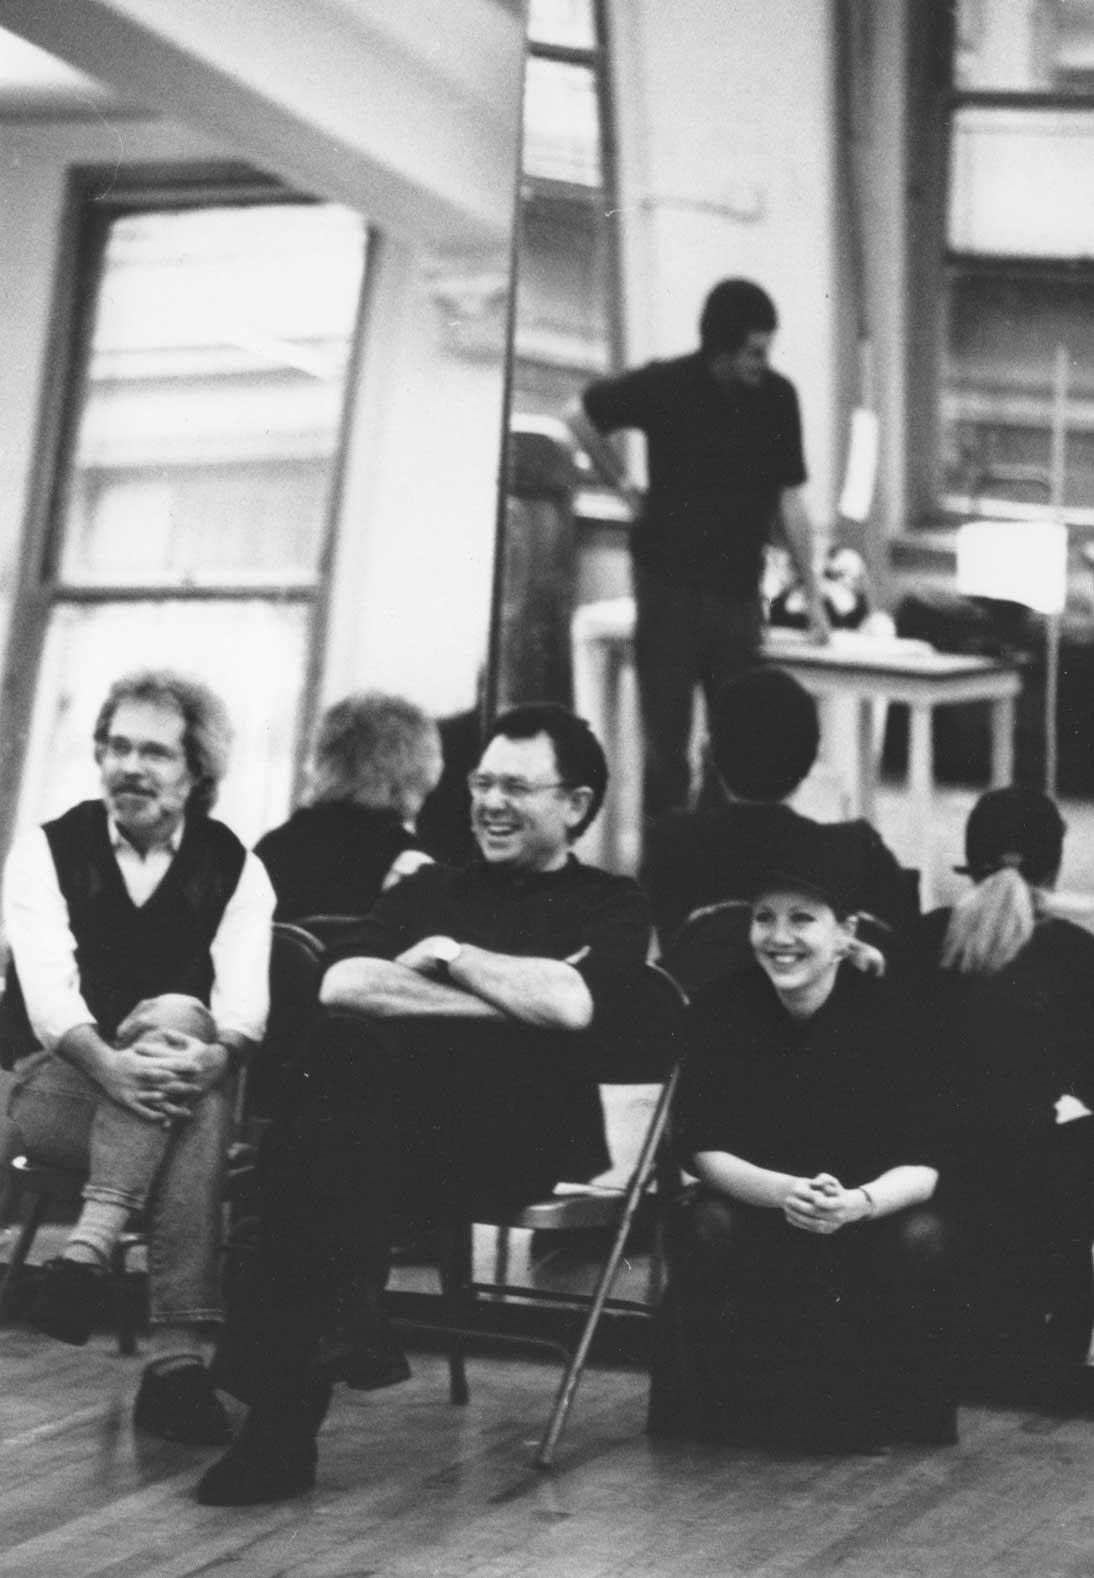 John Weidman, Mike Ockrent and Susan Stroman watch rehearsals for Big The Musical.